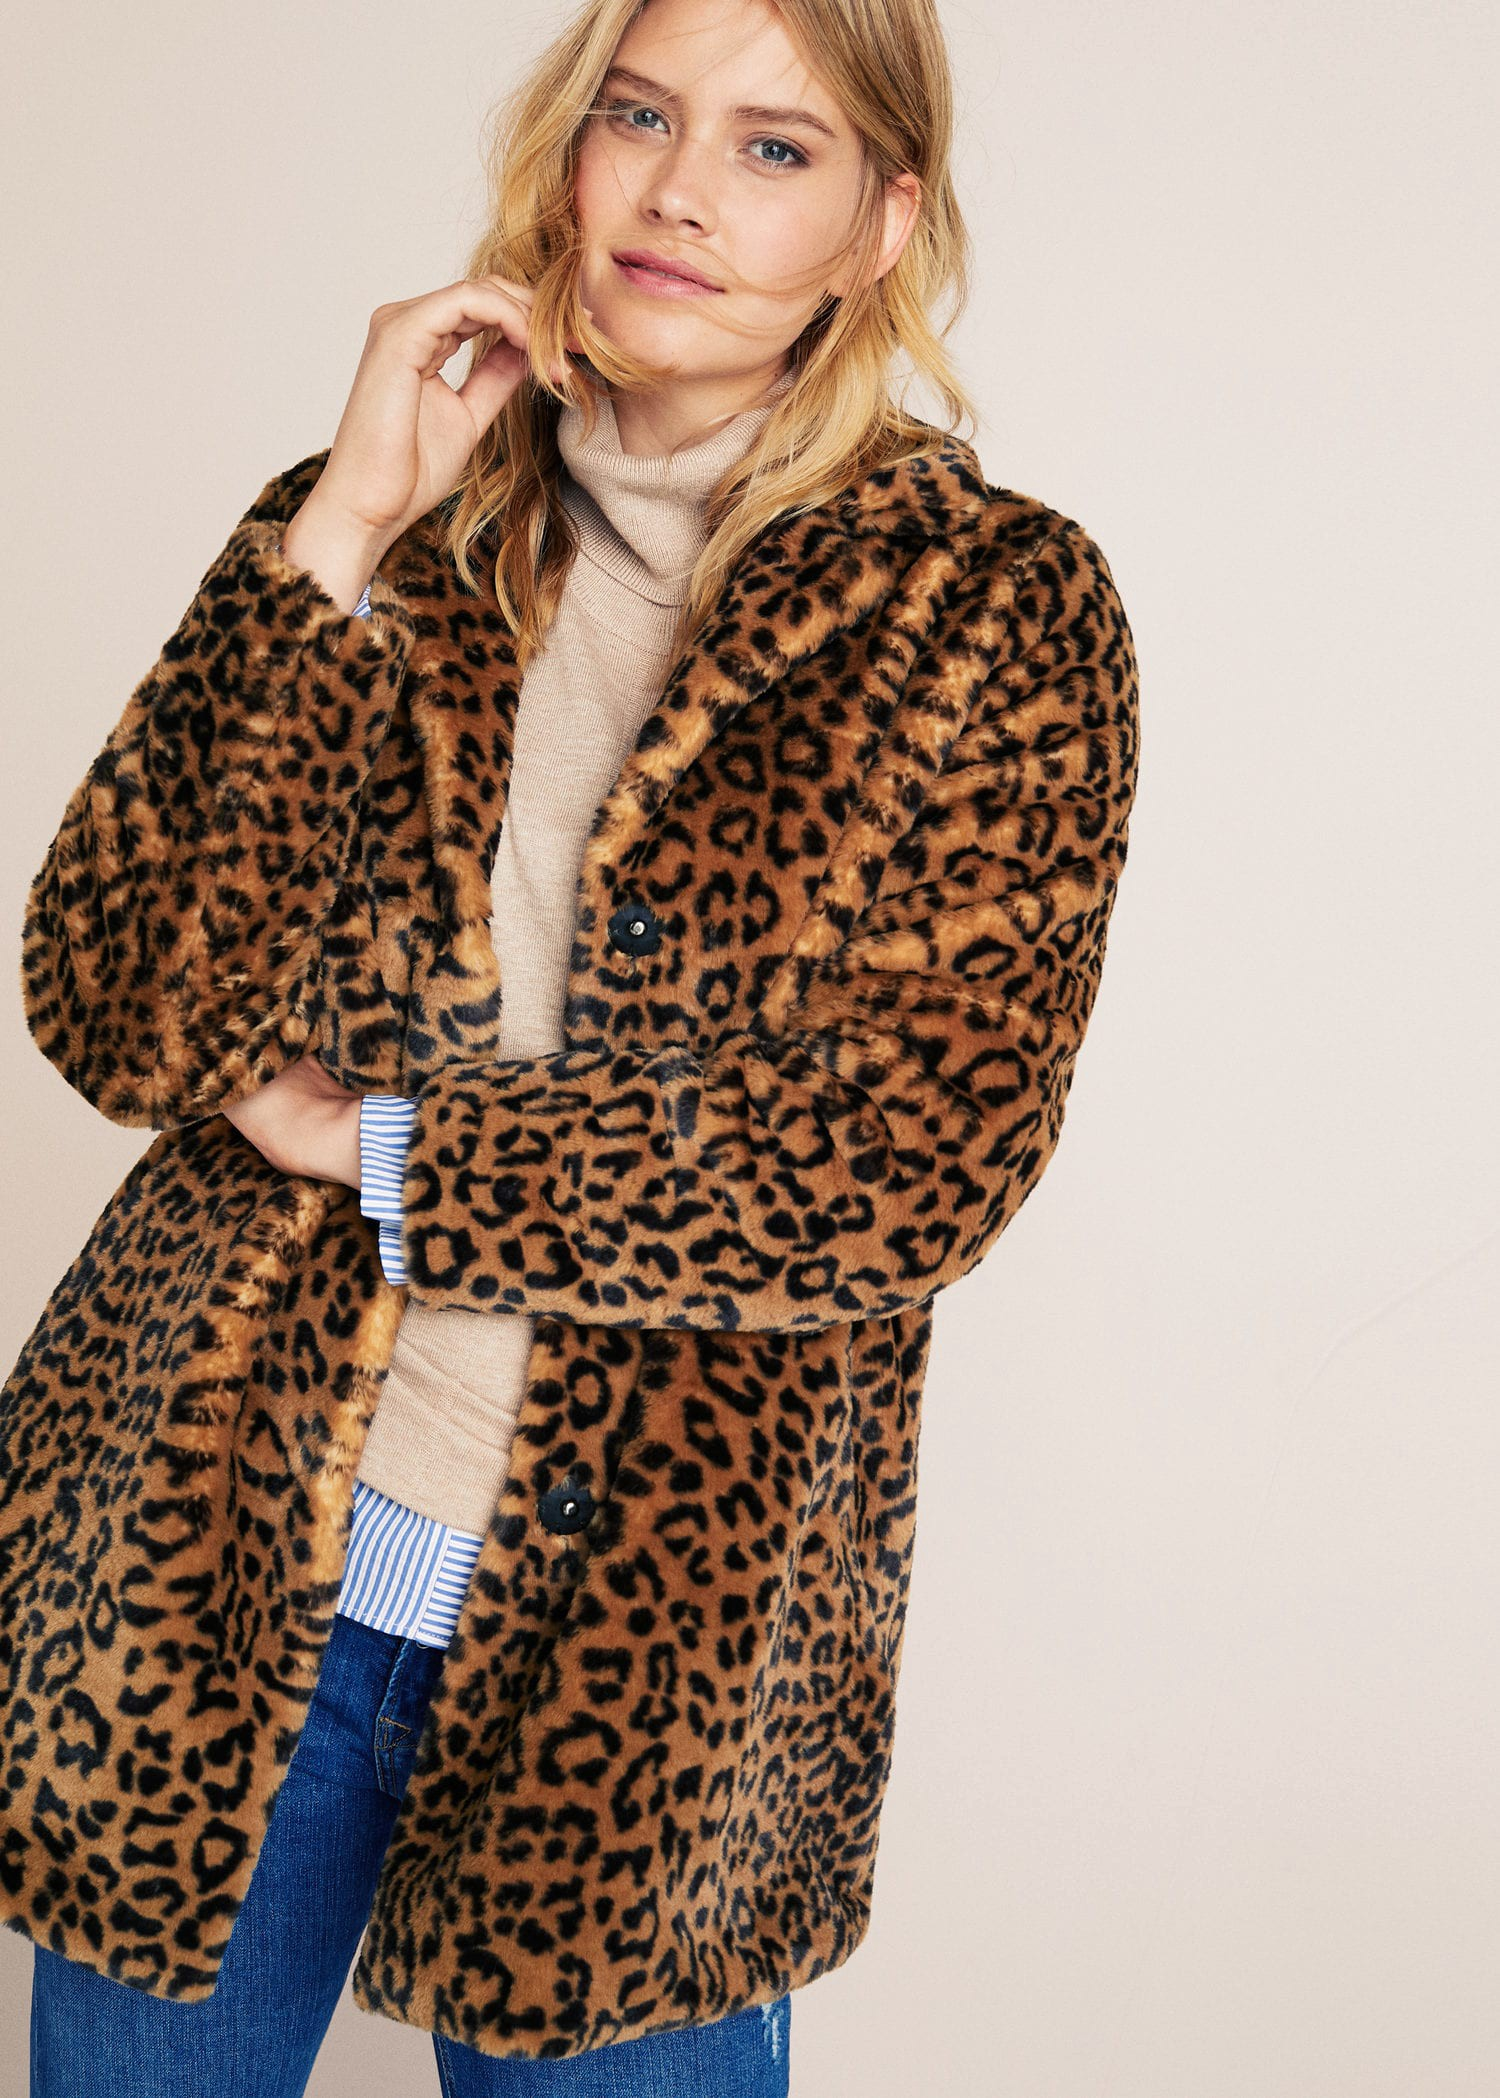 Mango Animal Print Faux Fur Coat M | Winter coats women